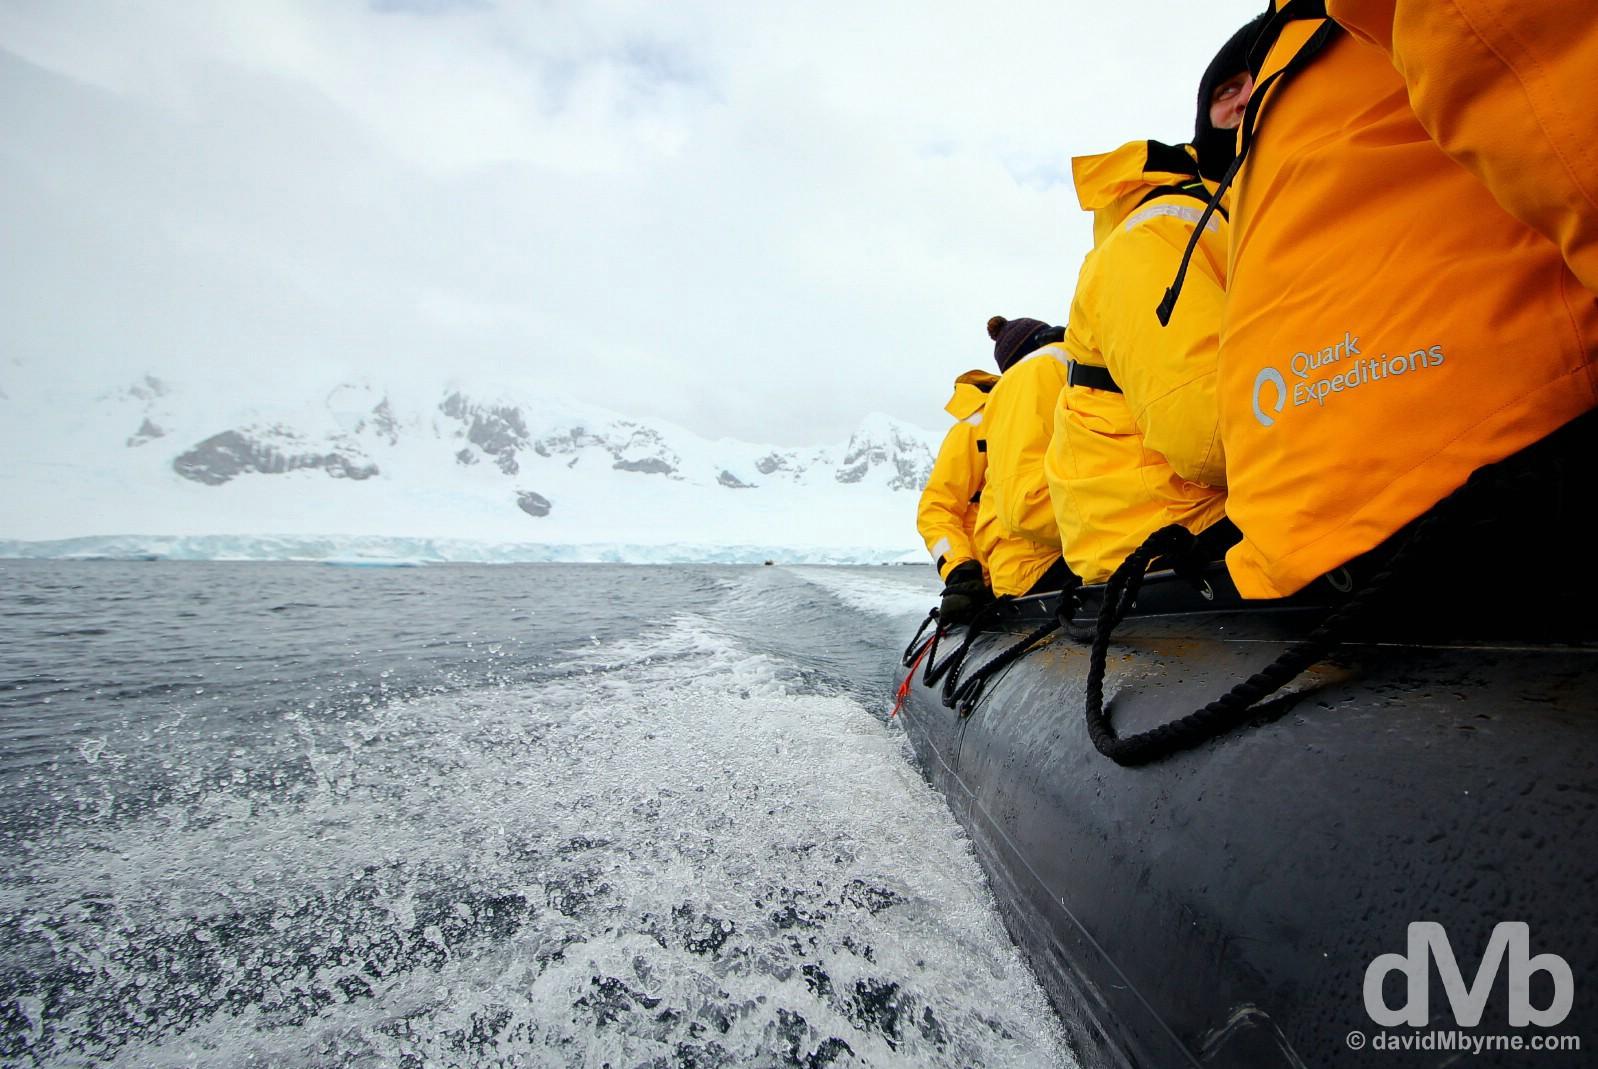 Zodiac cruising near Danco Island, Antarctic Peninsula. November 30, 2015.